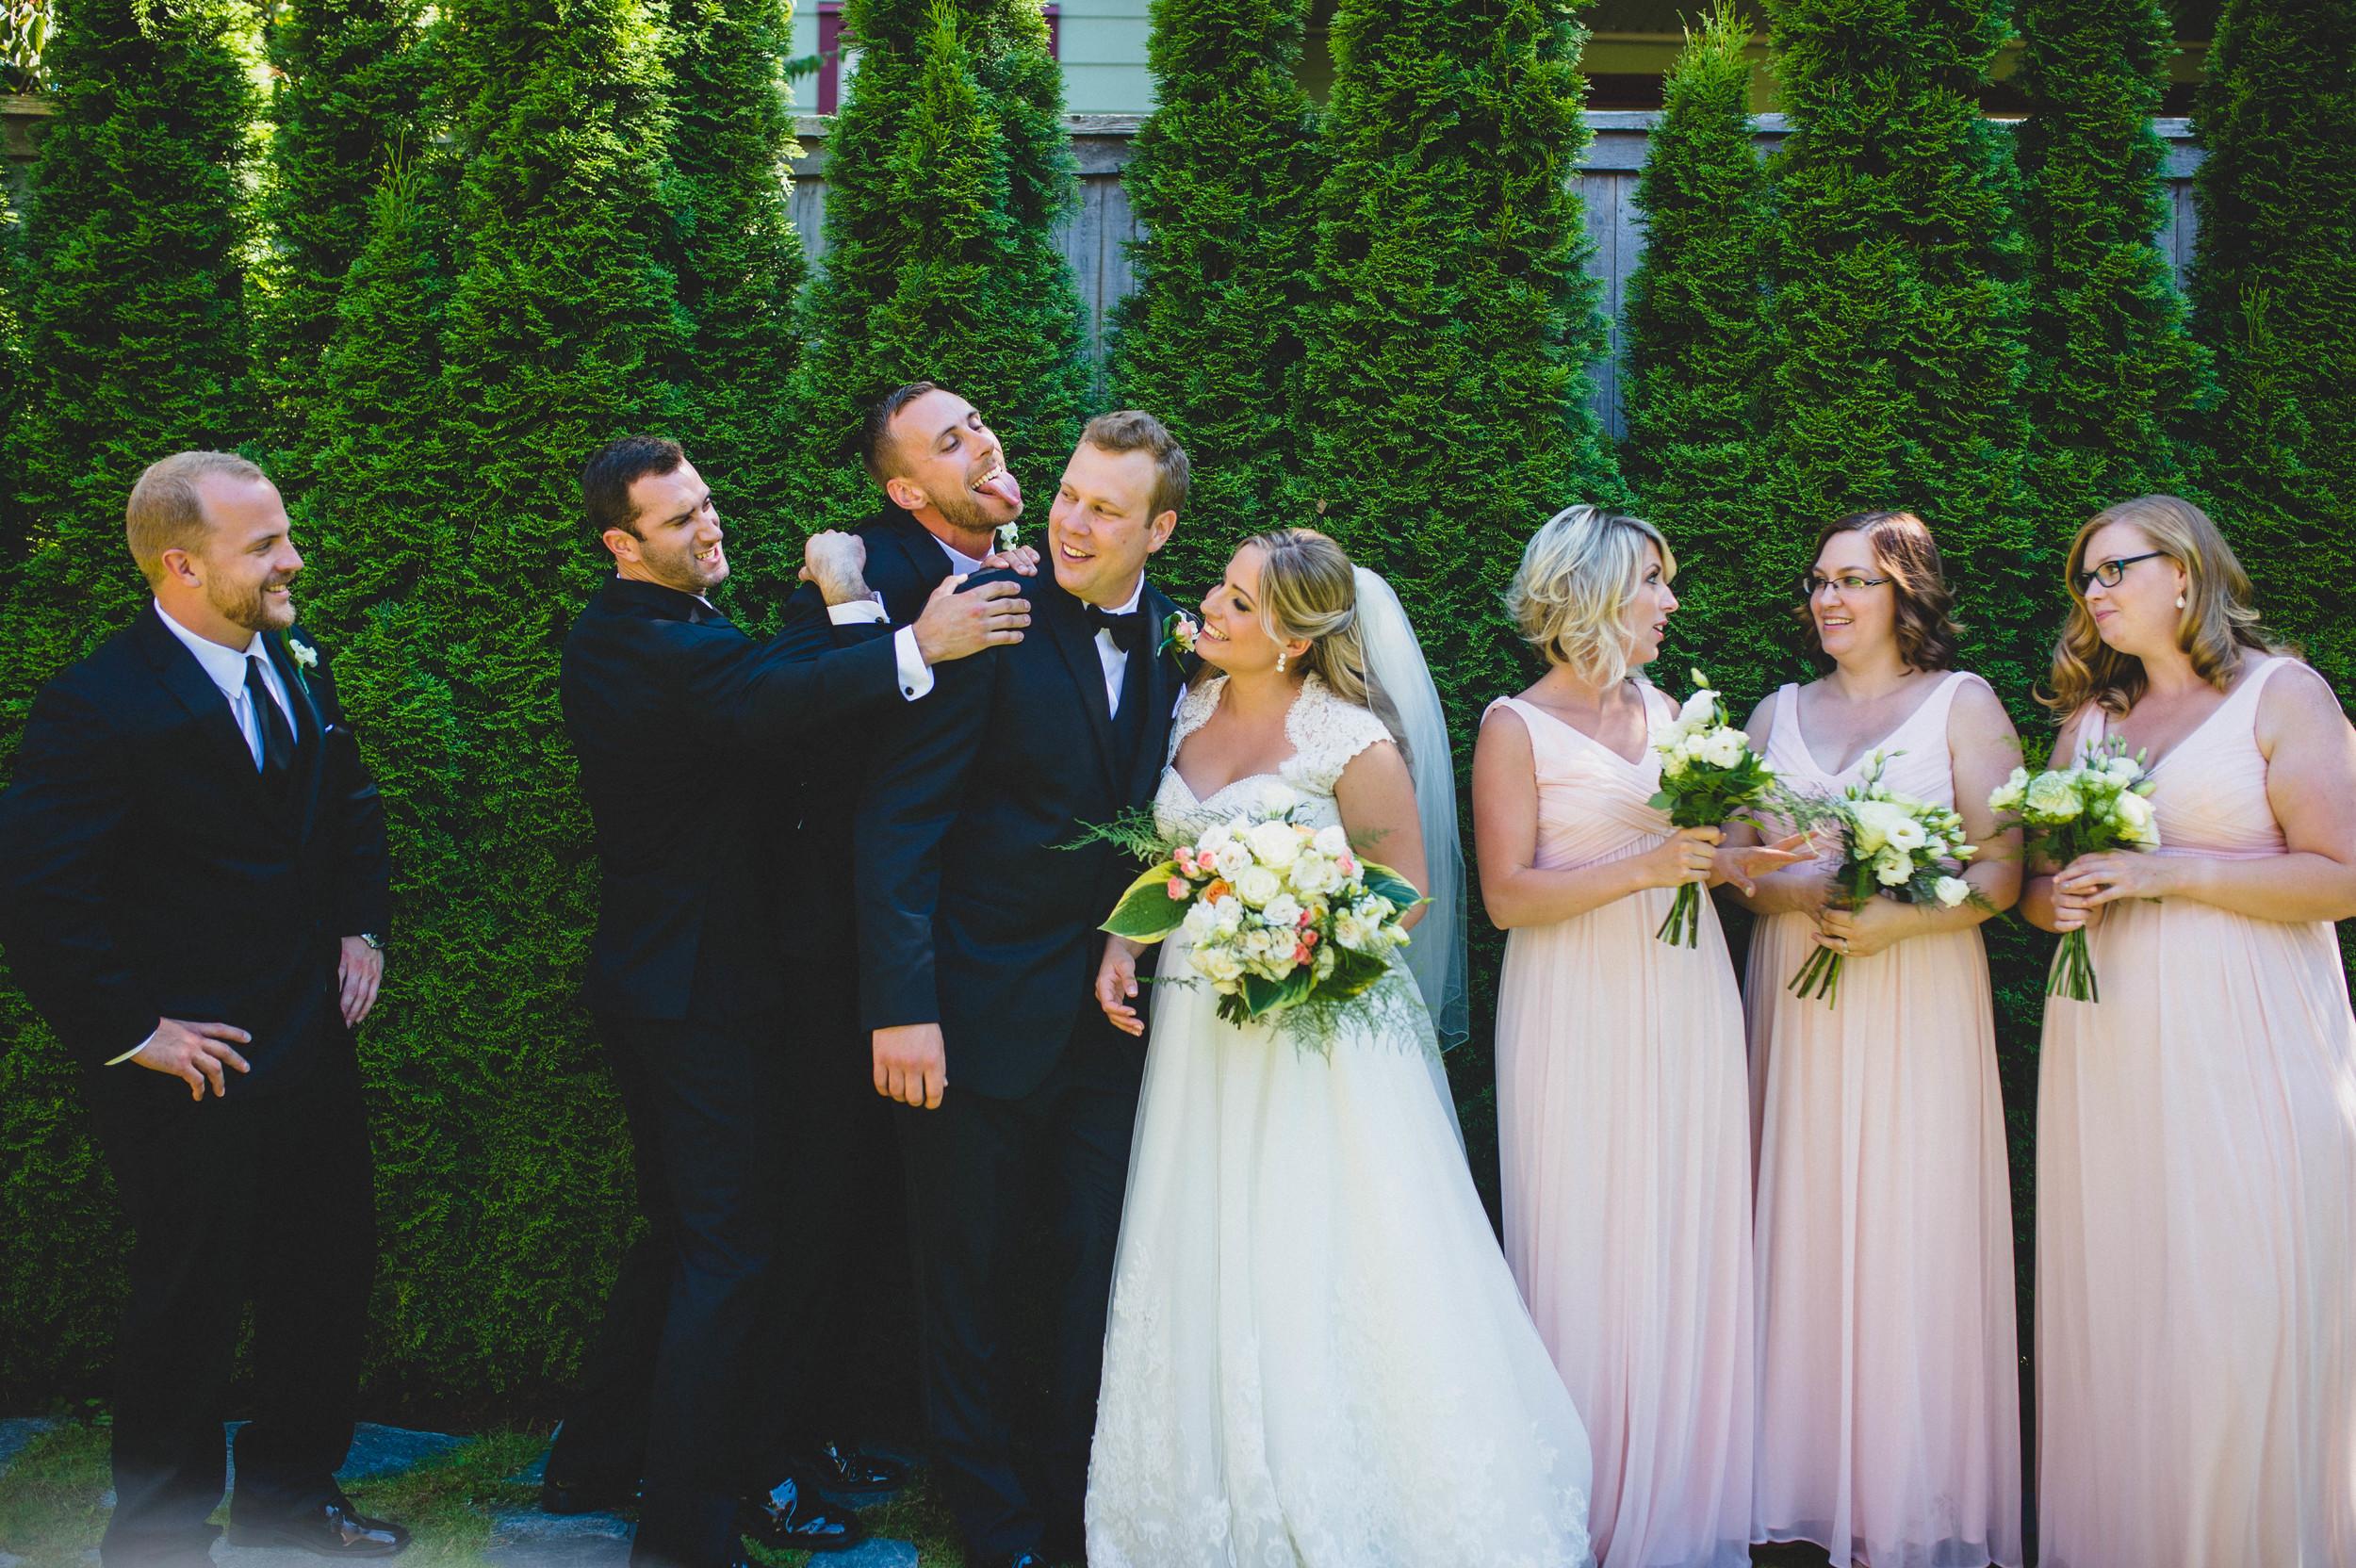 Vancouver St Augustine 's Church wedding photographer edward lai photography-59.jpg